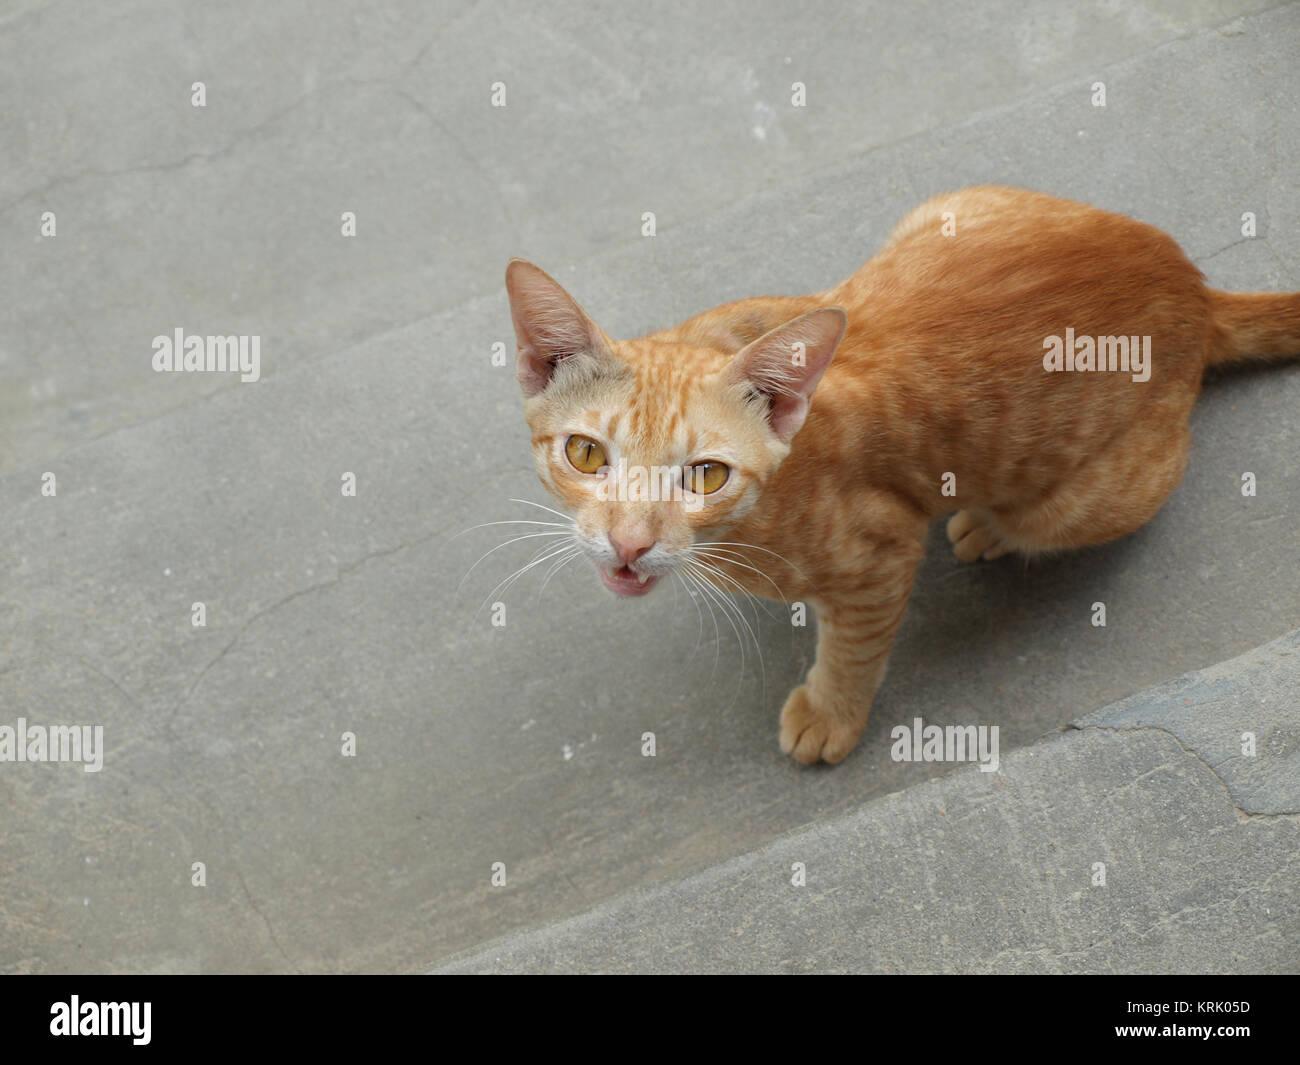 SNARLING CAT (angry cat looking at camera hissing aggressively) - Stock Image